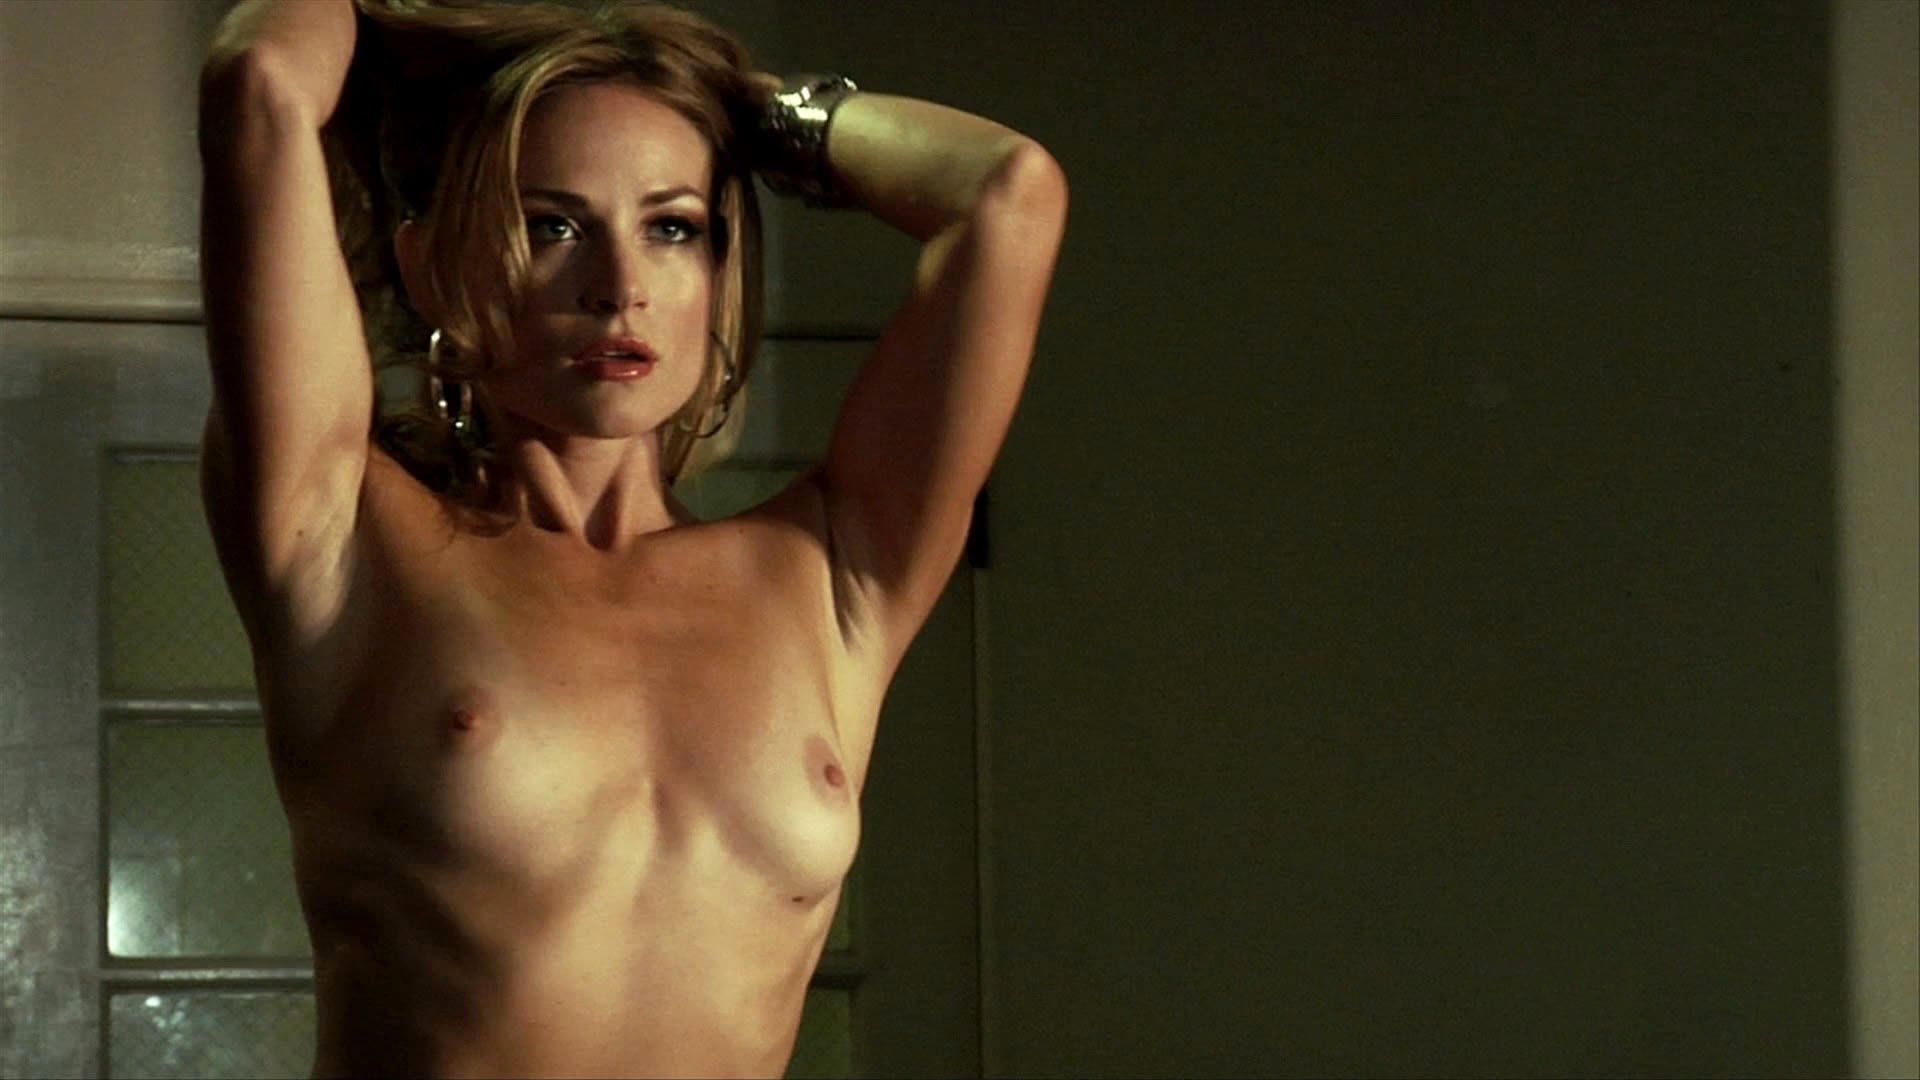 Hannah hoekstra nude the canal 2014 - 3 2